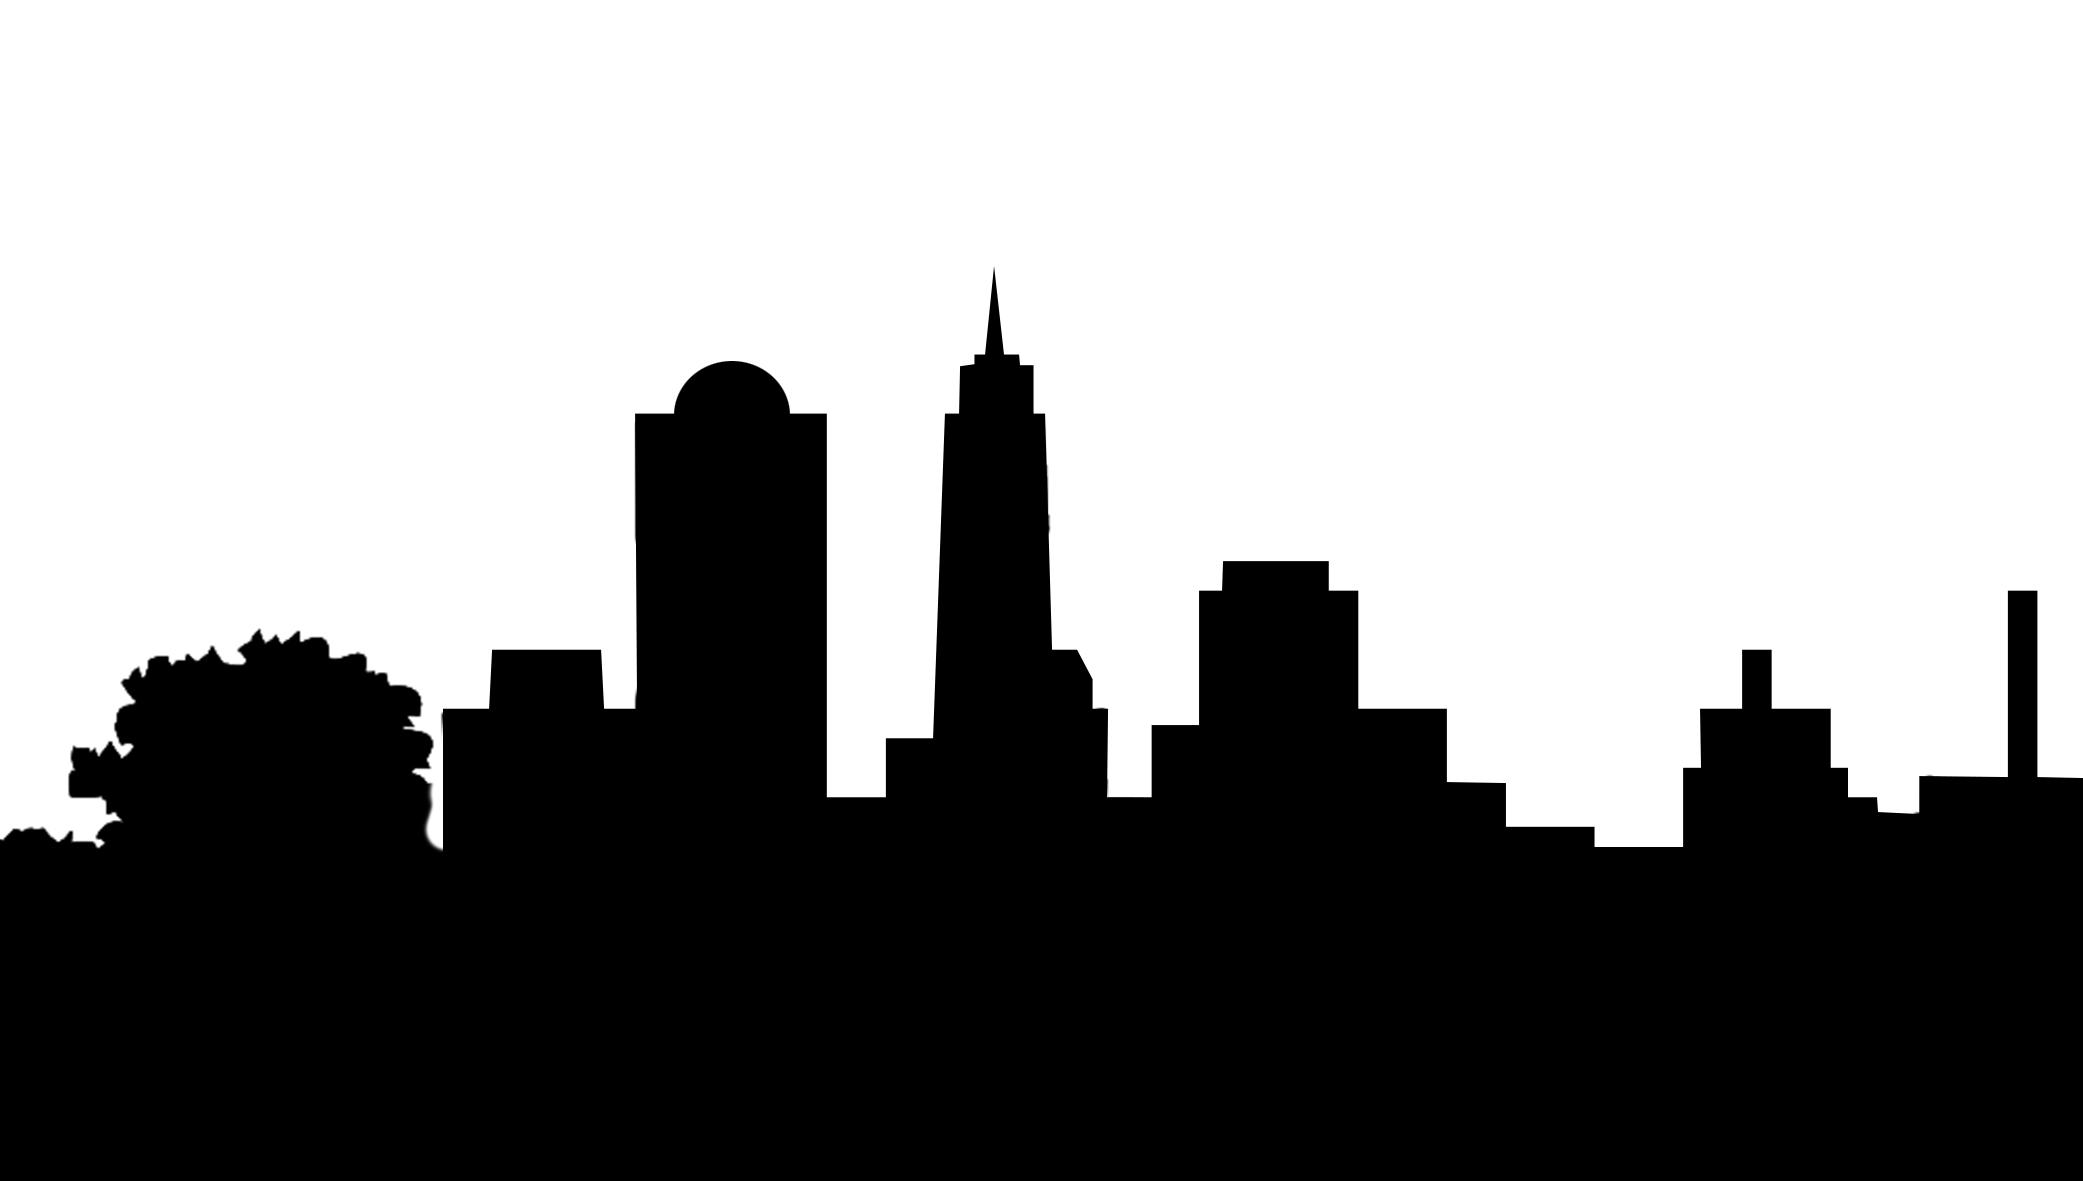 Silhouette . Cityscape clipart one